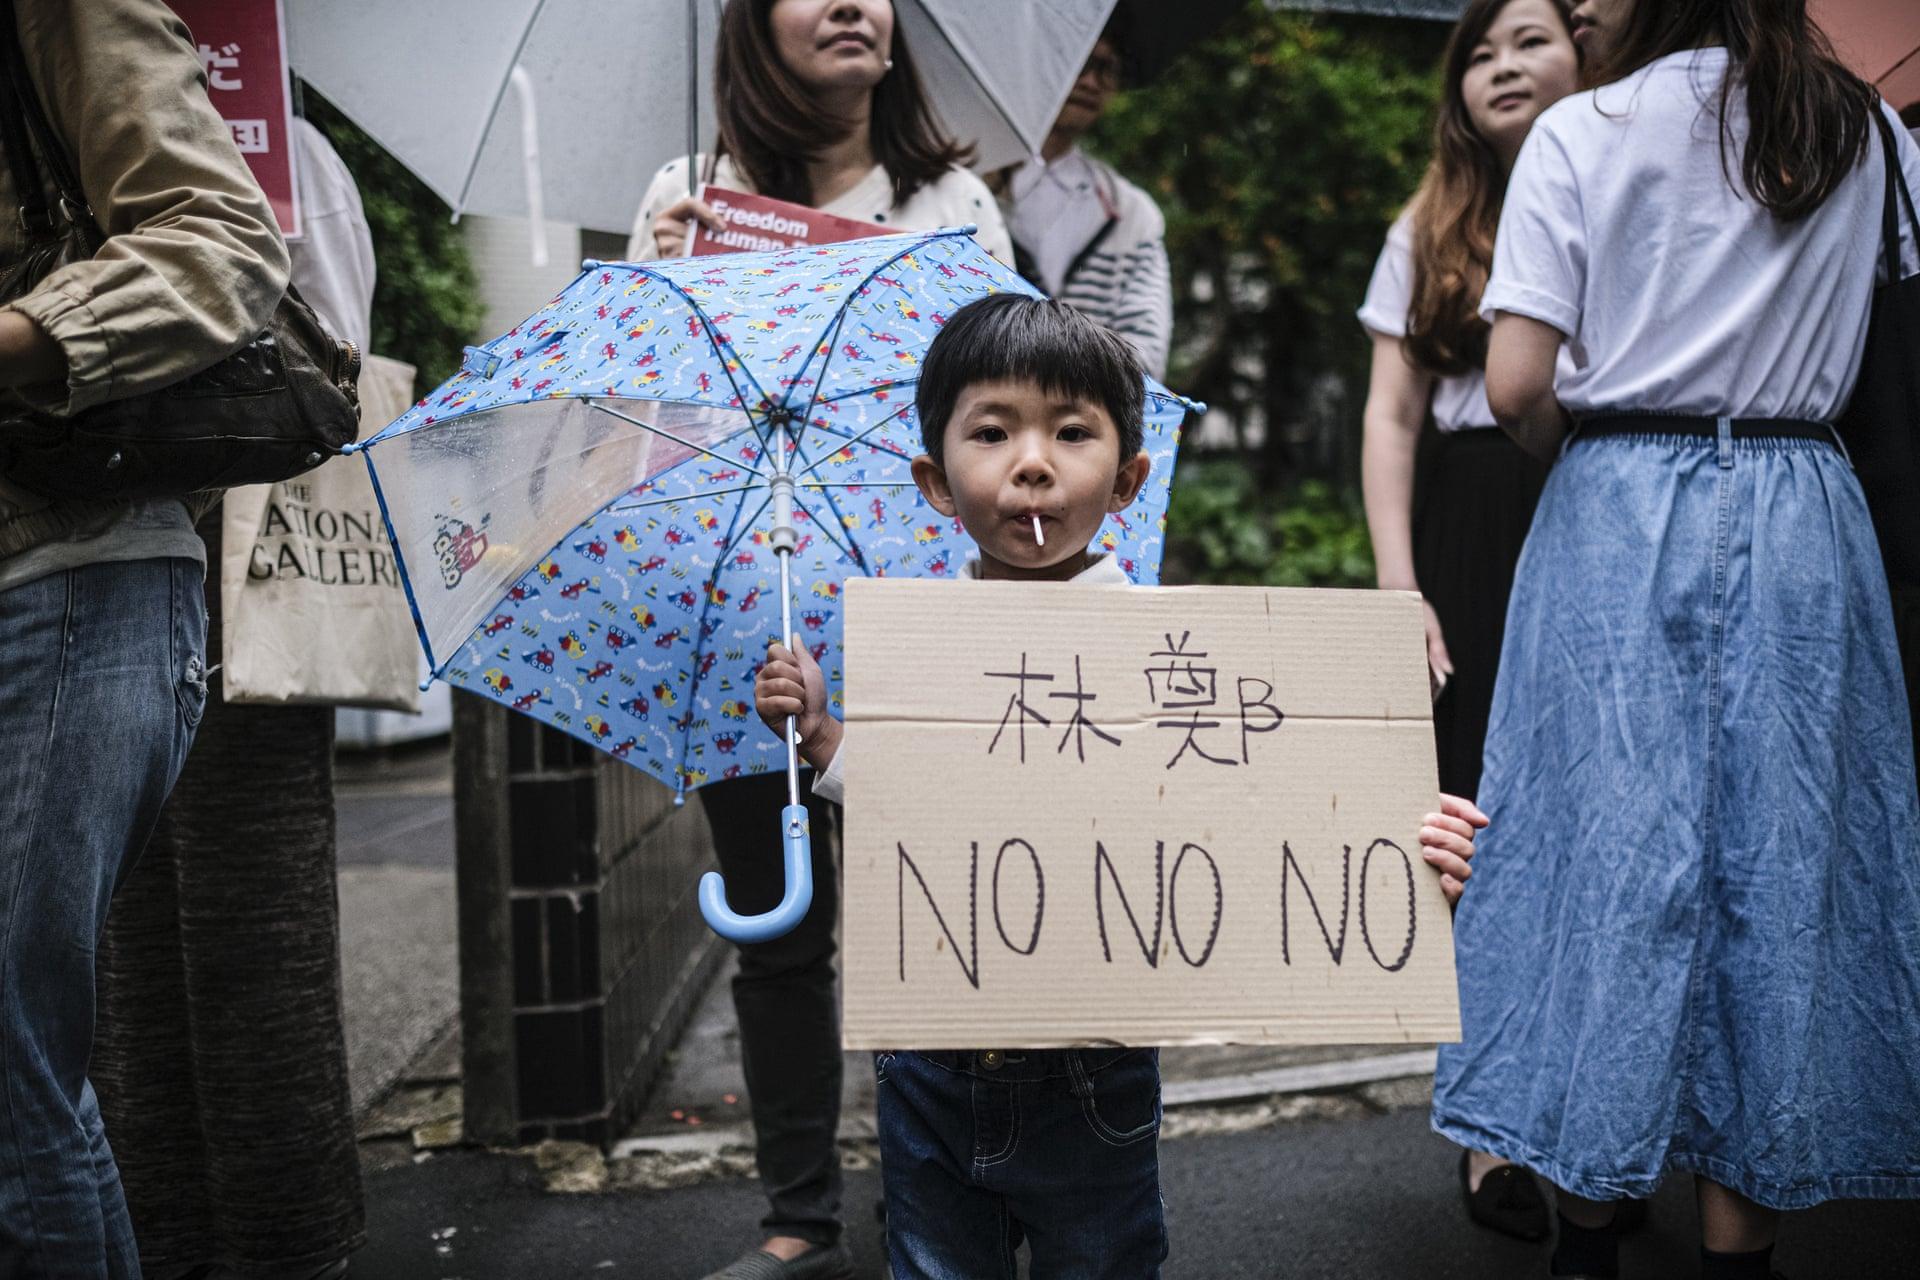 Keith Tsuji/Getty Images/SCANPIX